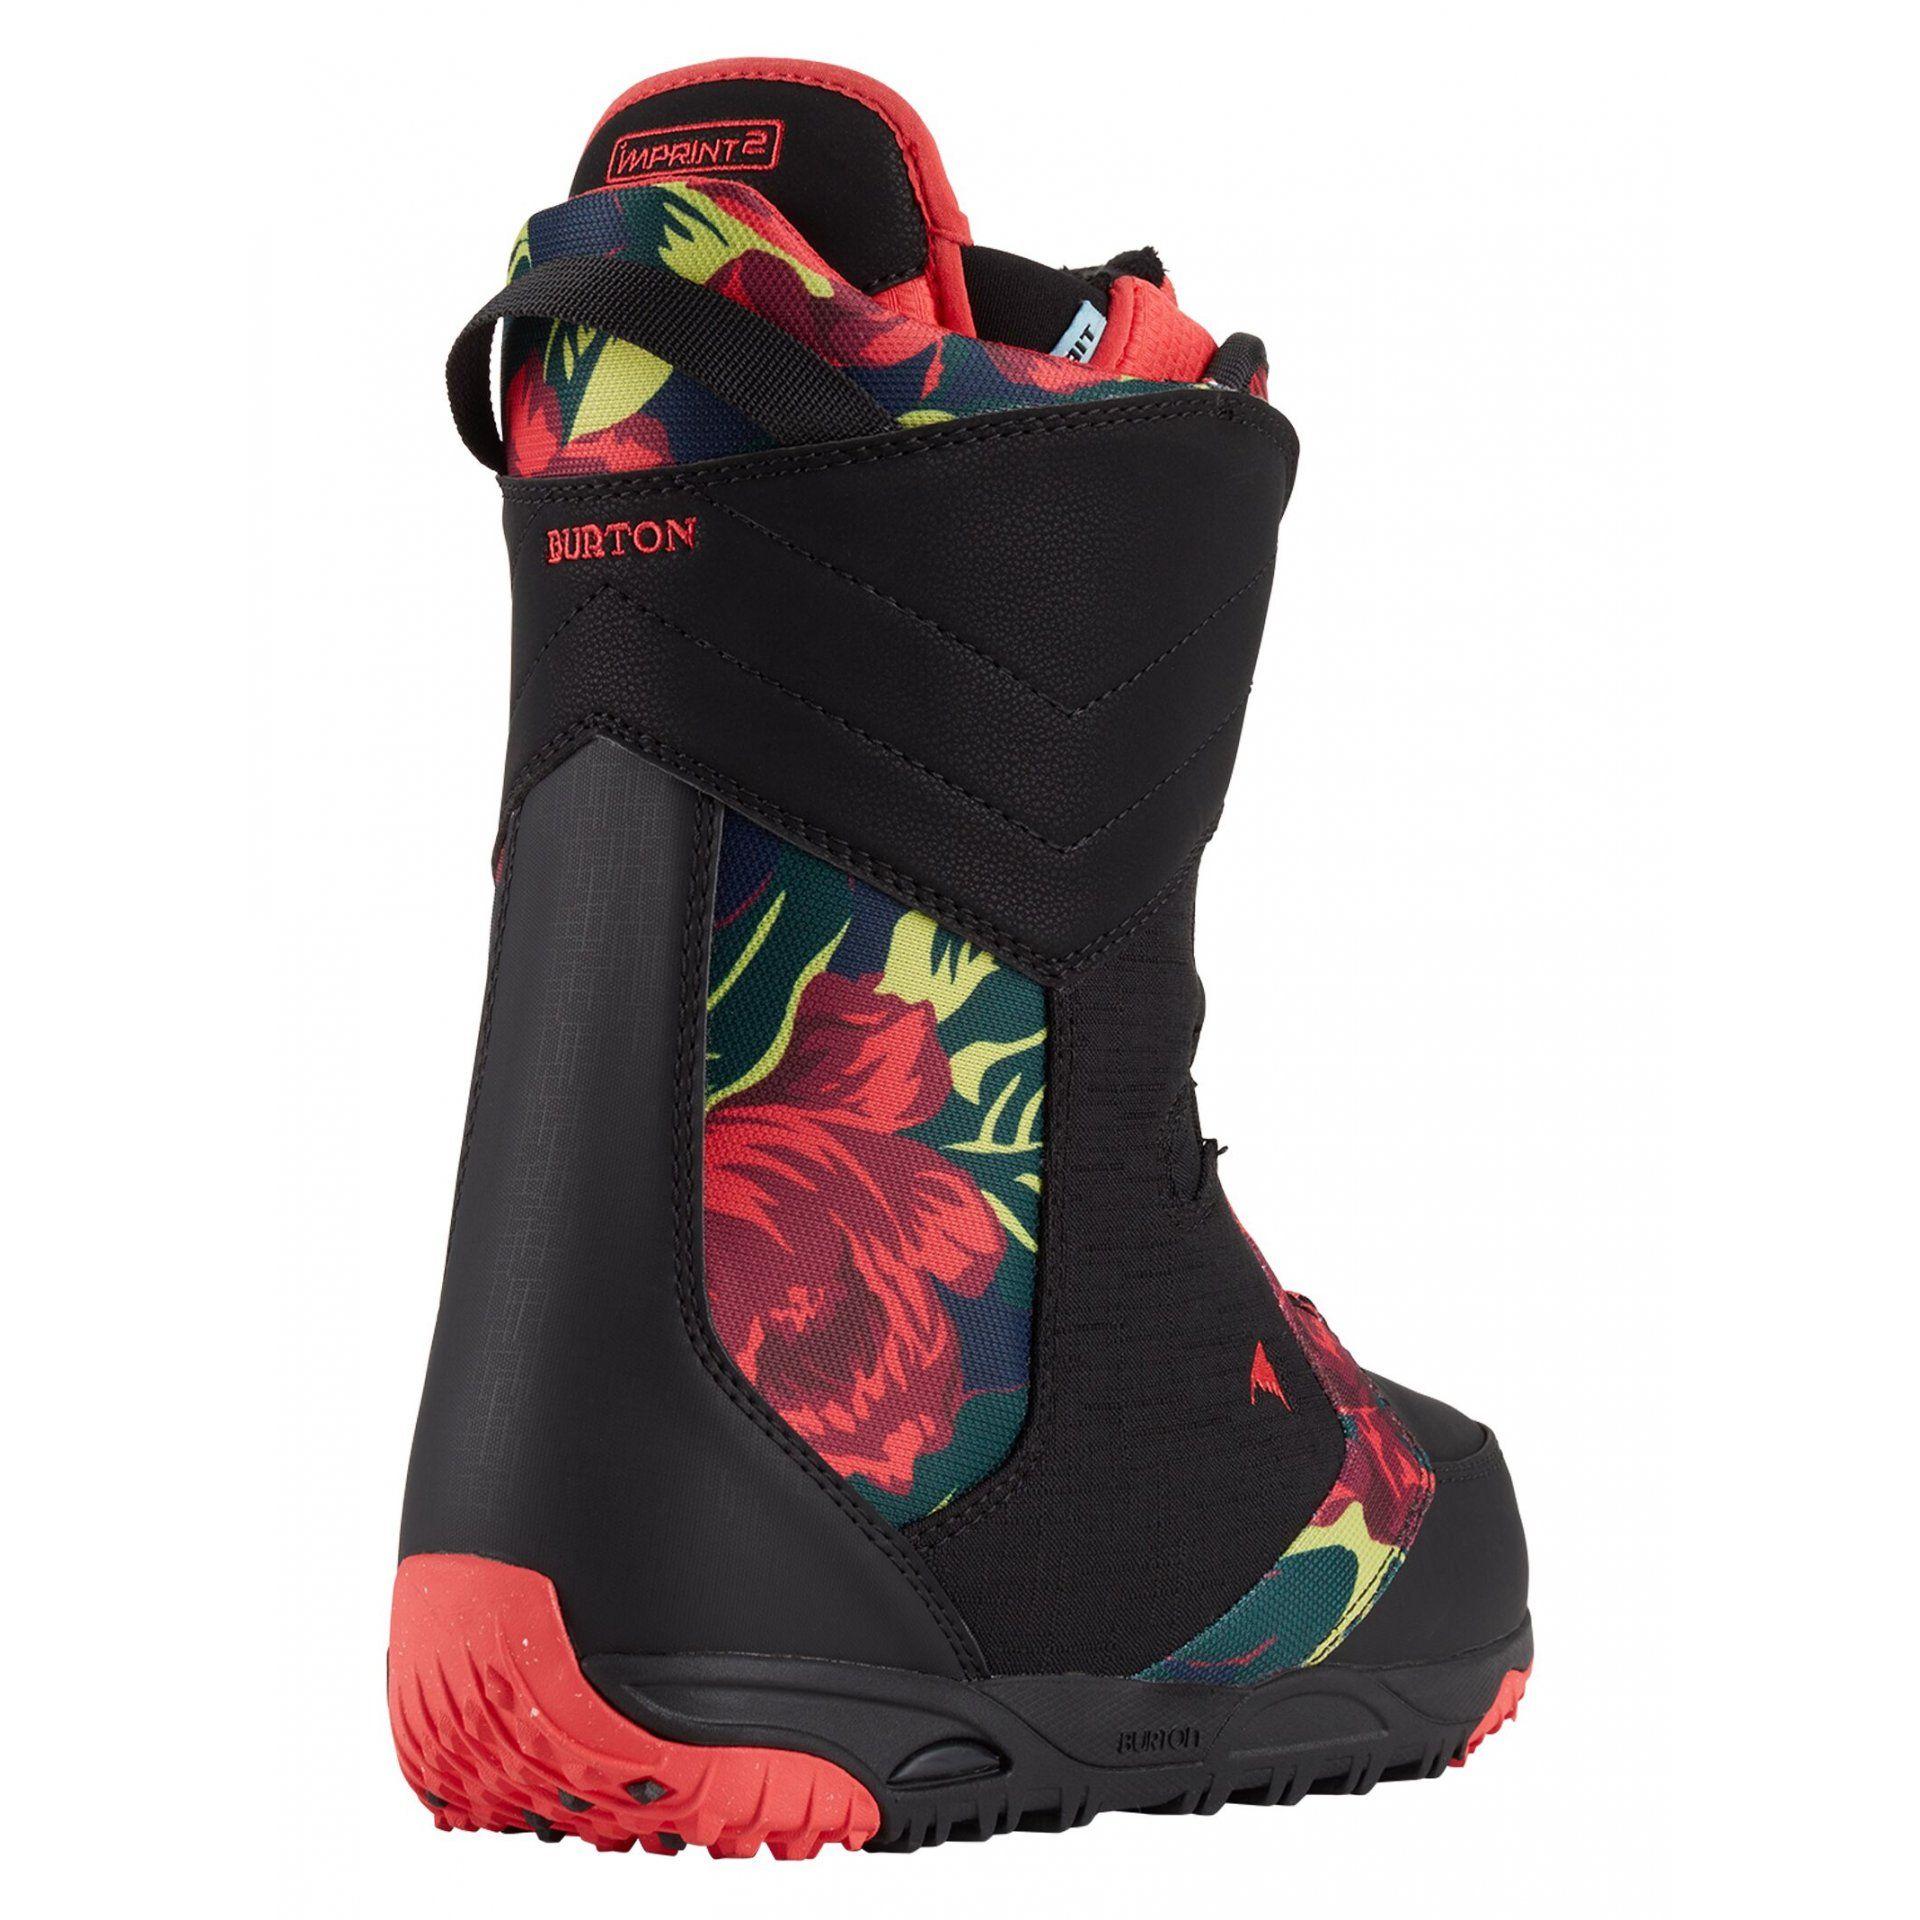 BUTY SNOWBOARDOWE BURTON LIMELIGHT BOA 150871-002 BLACK FLORAL 2